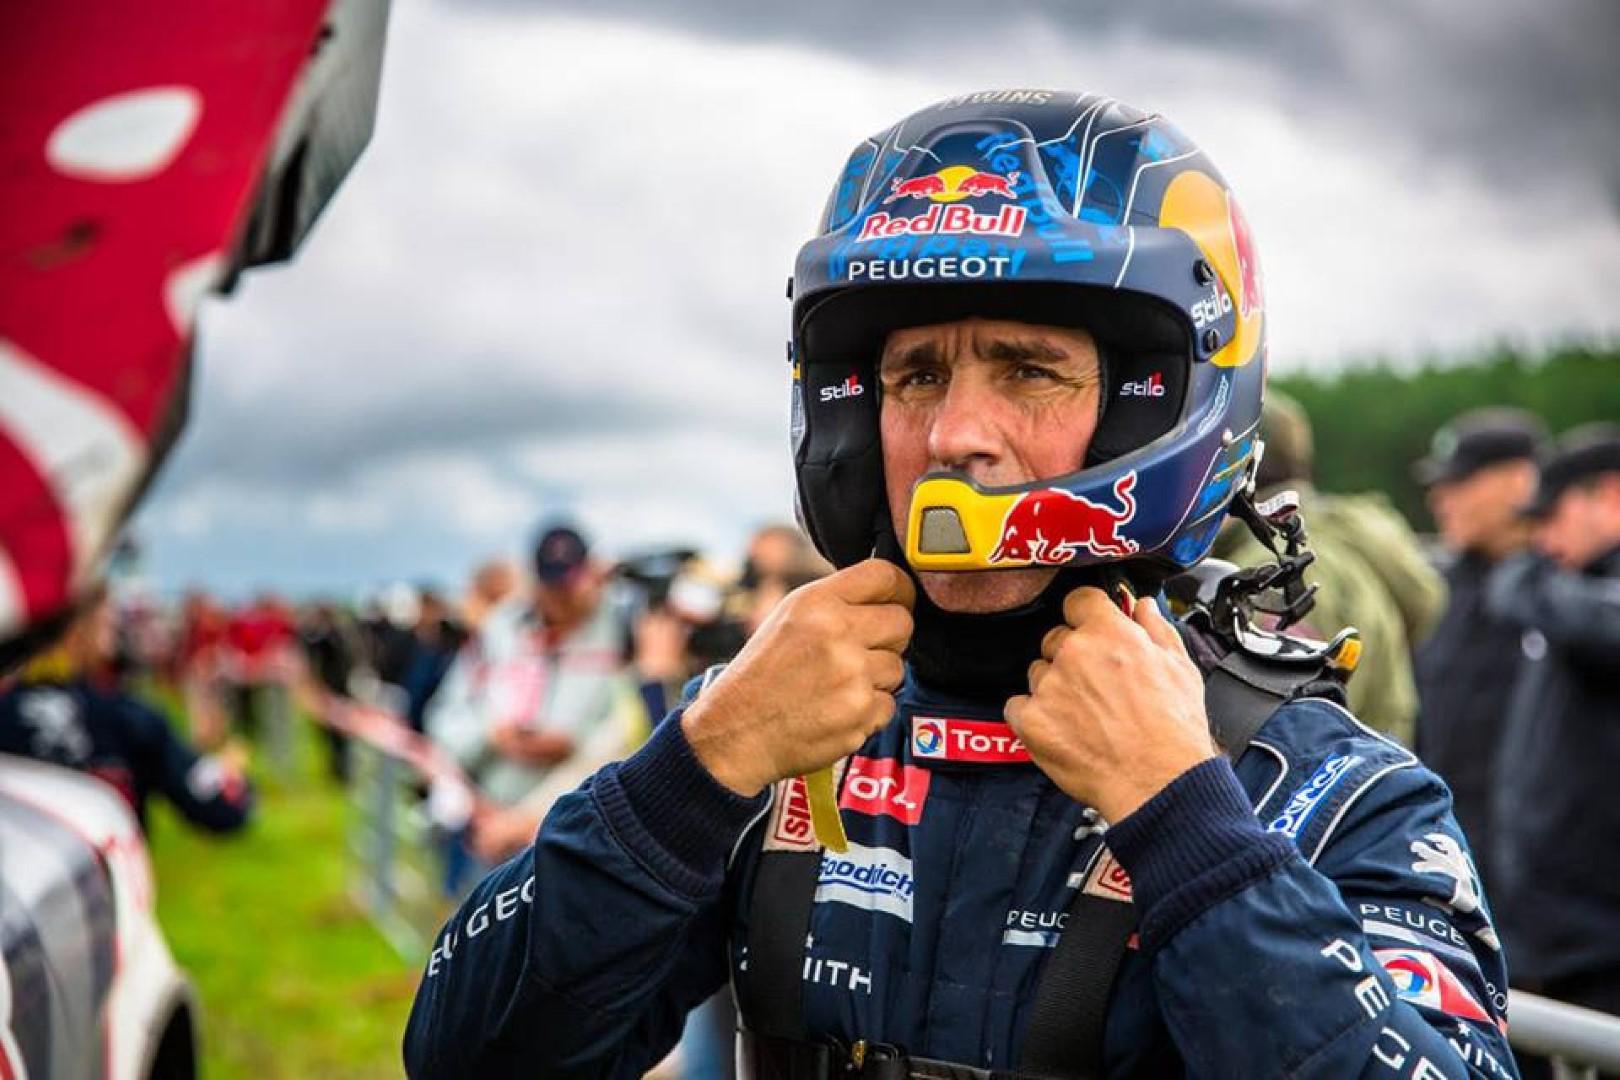 Silkway Rally 2017: Stéphane Peterhansel s'impose et prend la tête